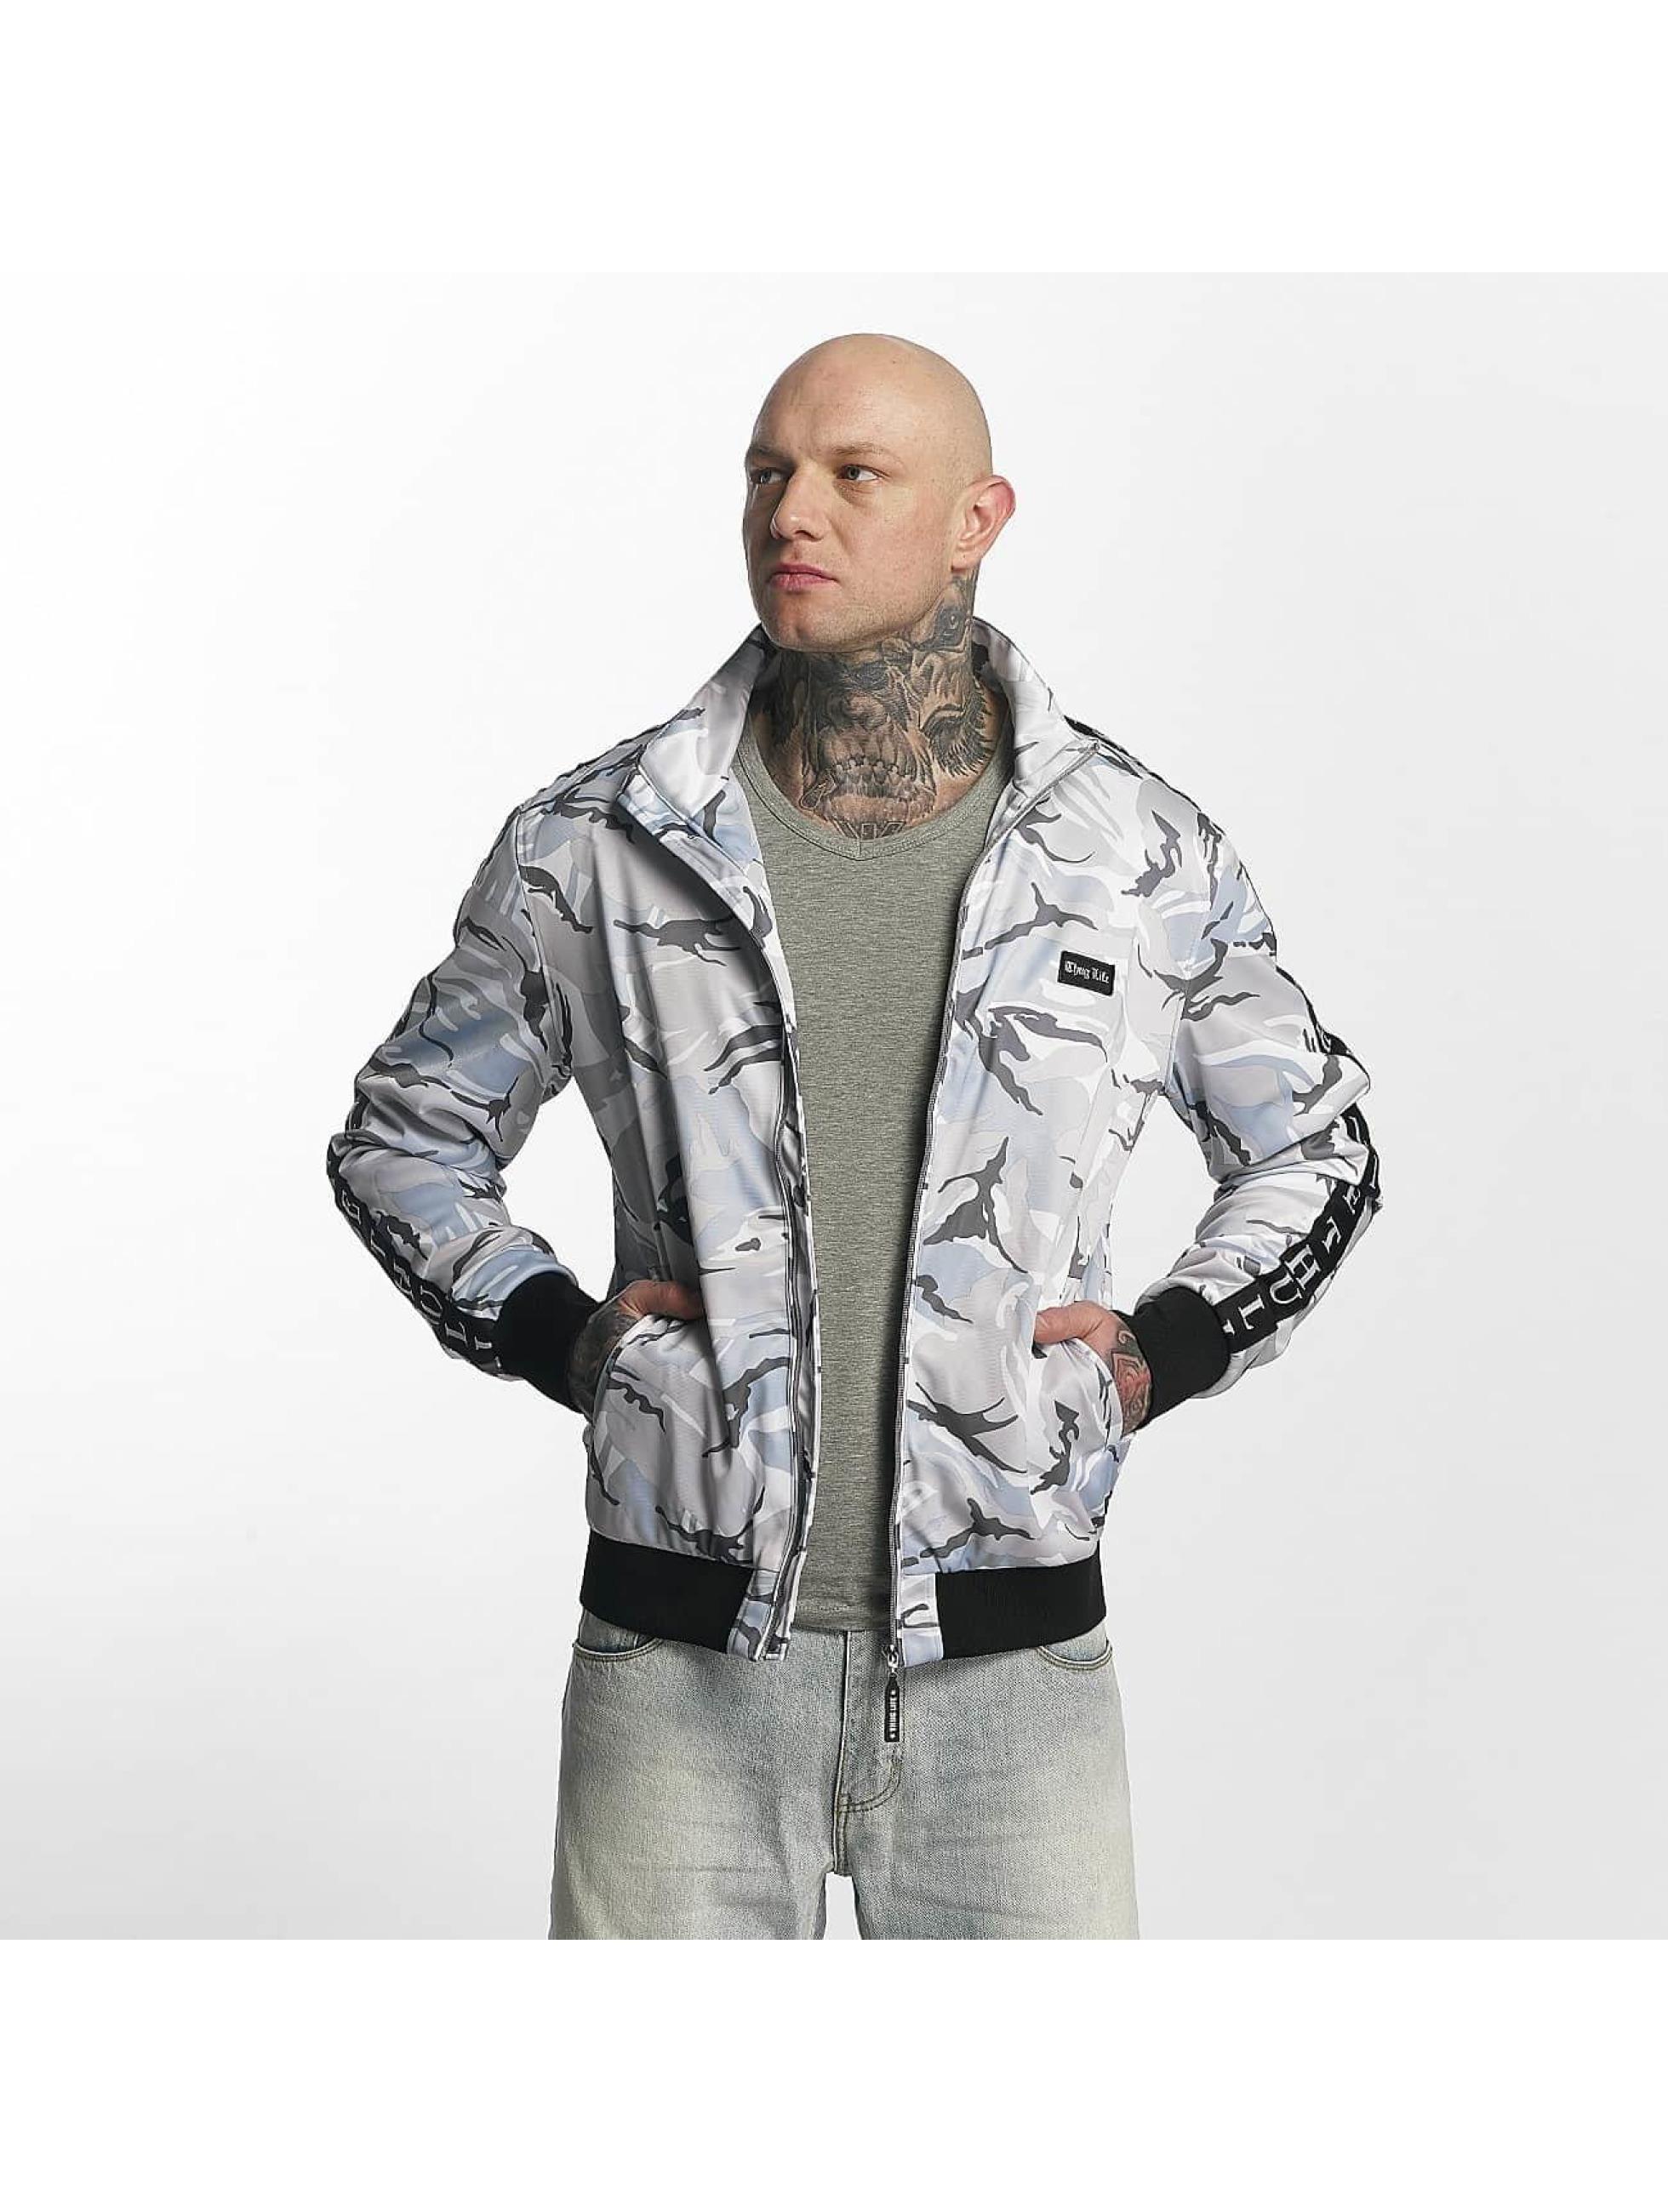 Thug Life / Lightweight Jacket Wired in white XL